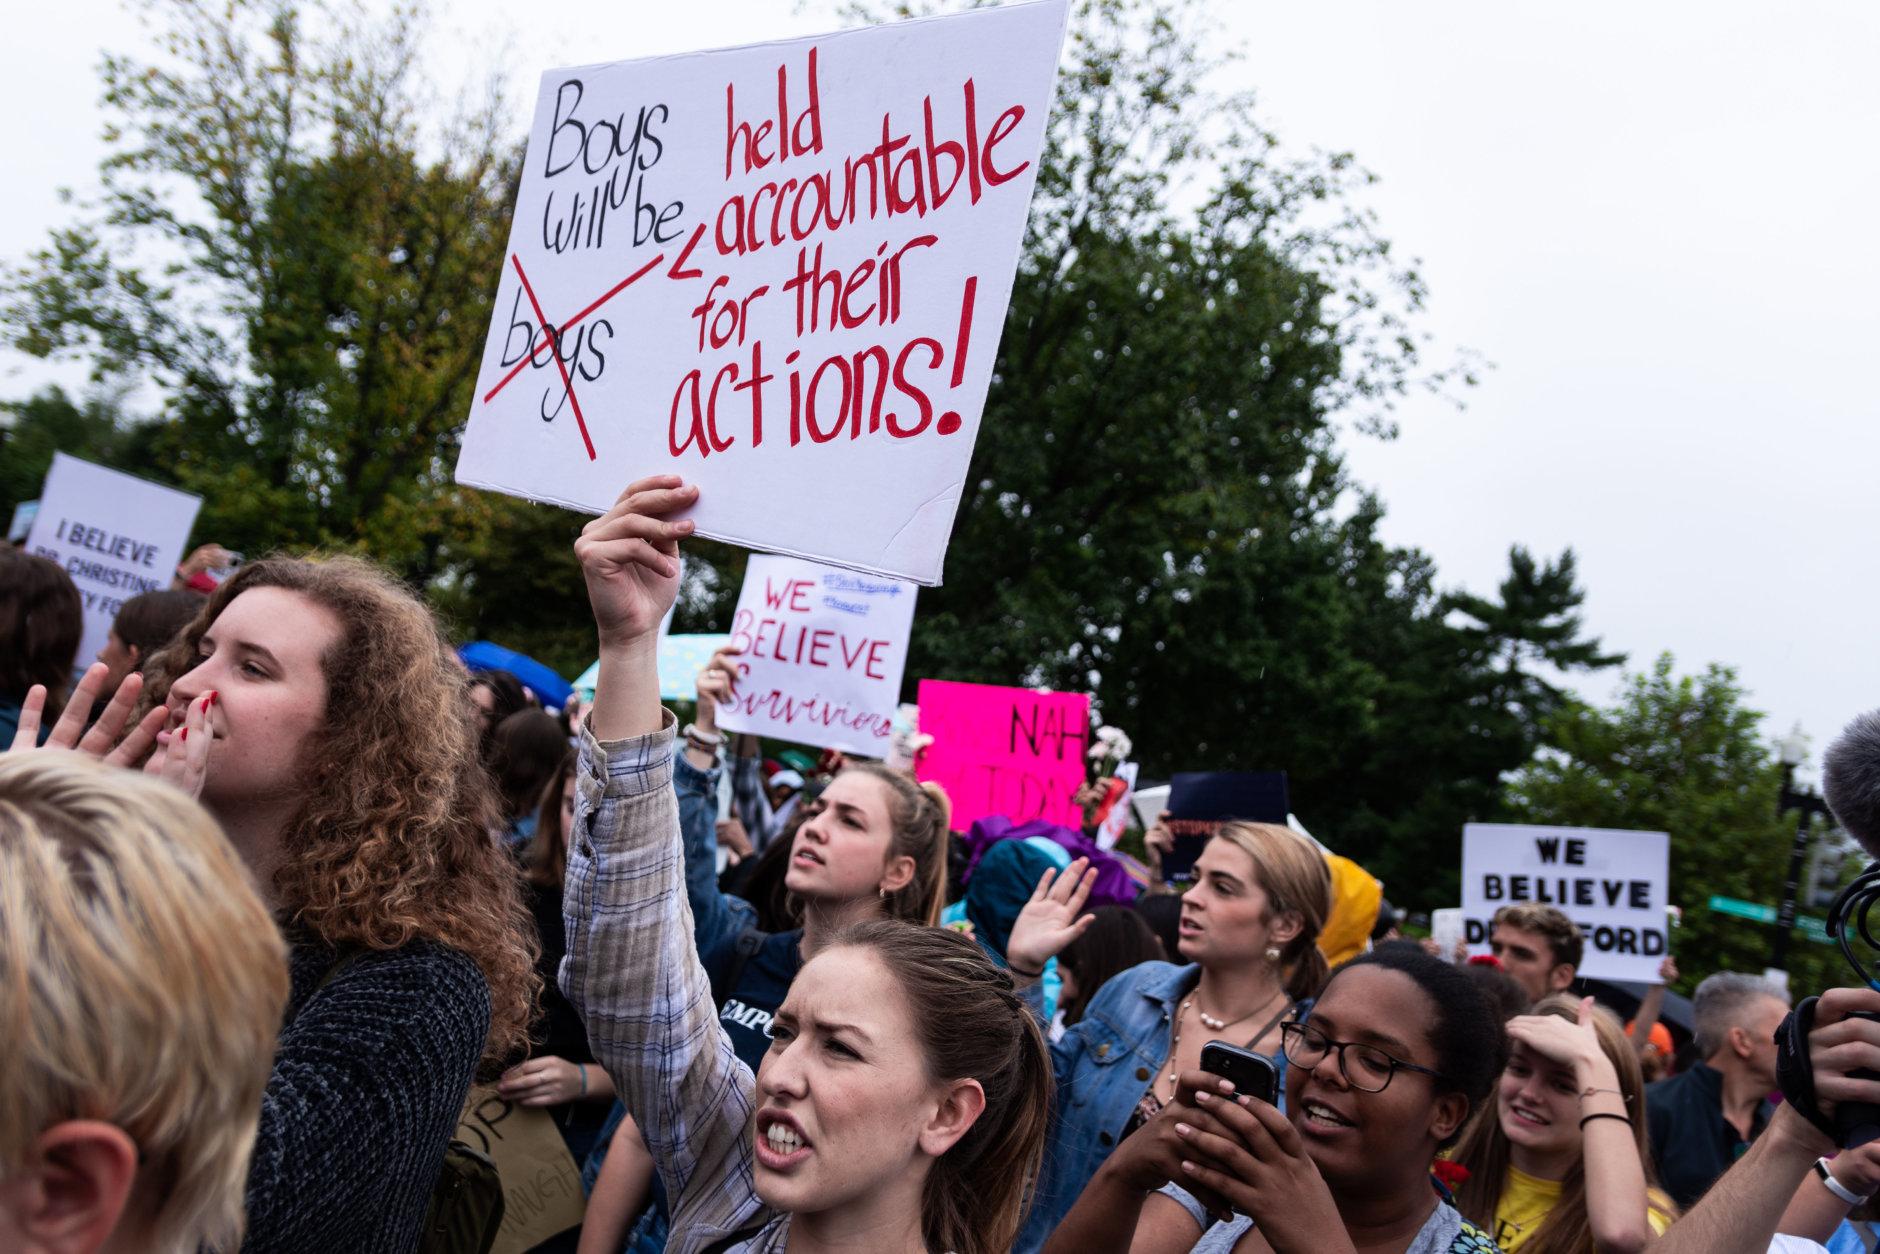 Women demonstrate in support of Christine Blasey Ford outside of the Supreme Court in D.C. on Thursday, September 28, 2018. (WTOP/Alejandro Alvarez)